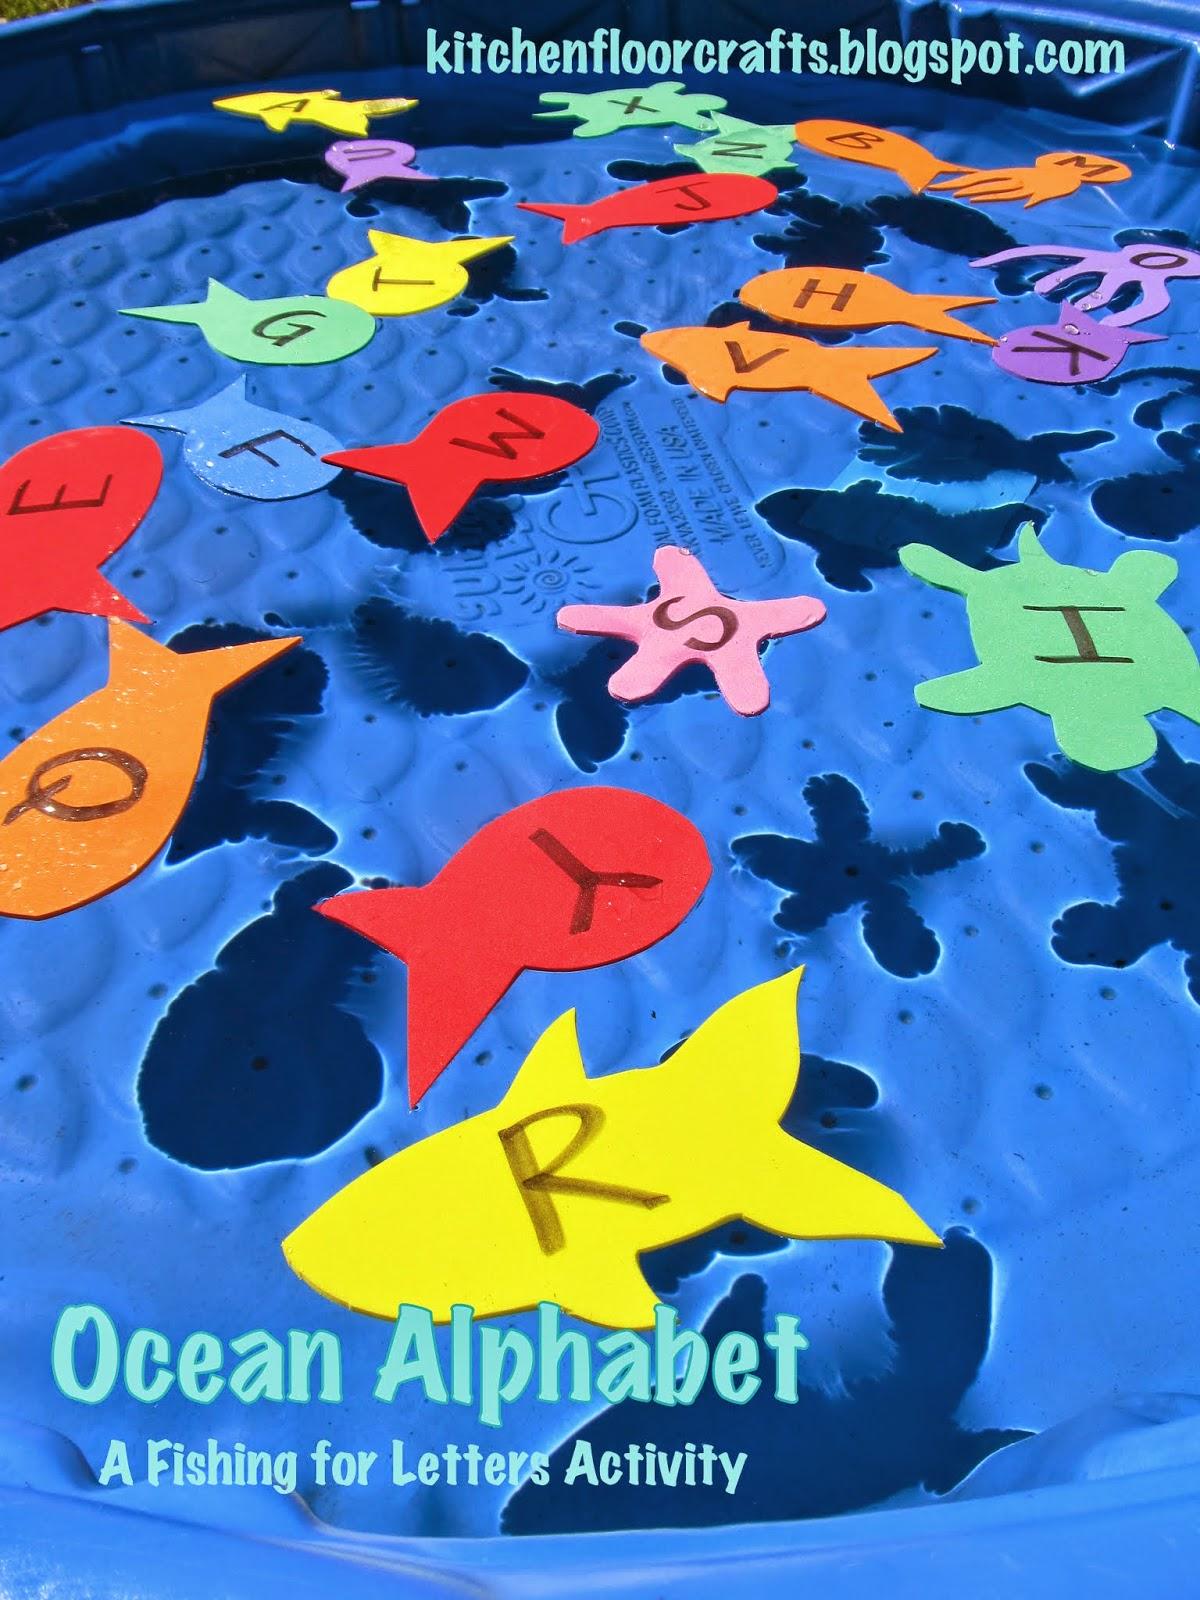 Kitchen Floor Crafts Ocean Alphabet